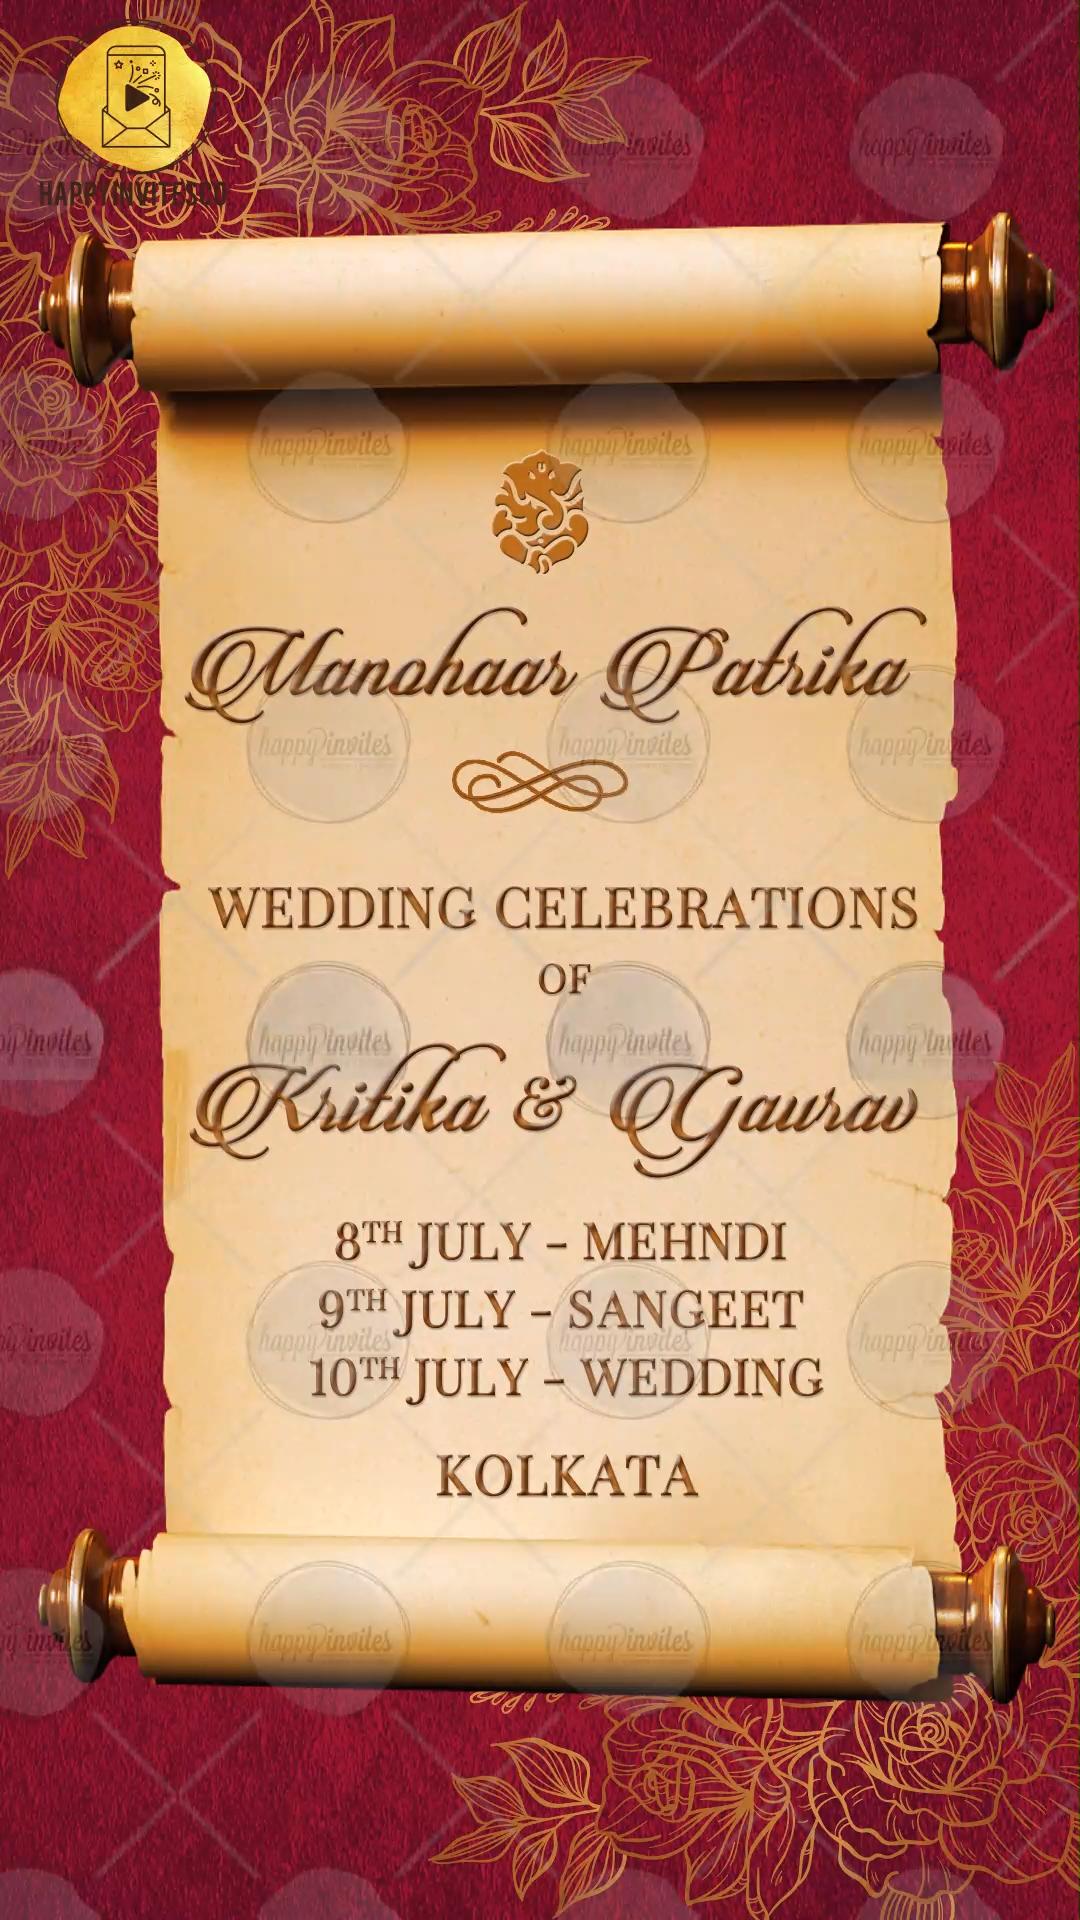 Indian Wedding Invitation Video Maker Online Happy Invites Video Video Hindu Wedding Invitation Cards Hindu Wedding Invitations Engagement Invitation Cards